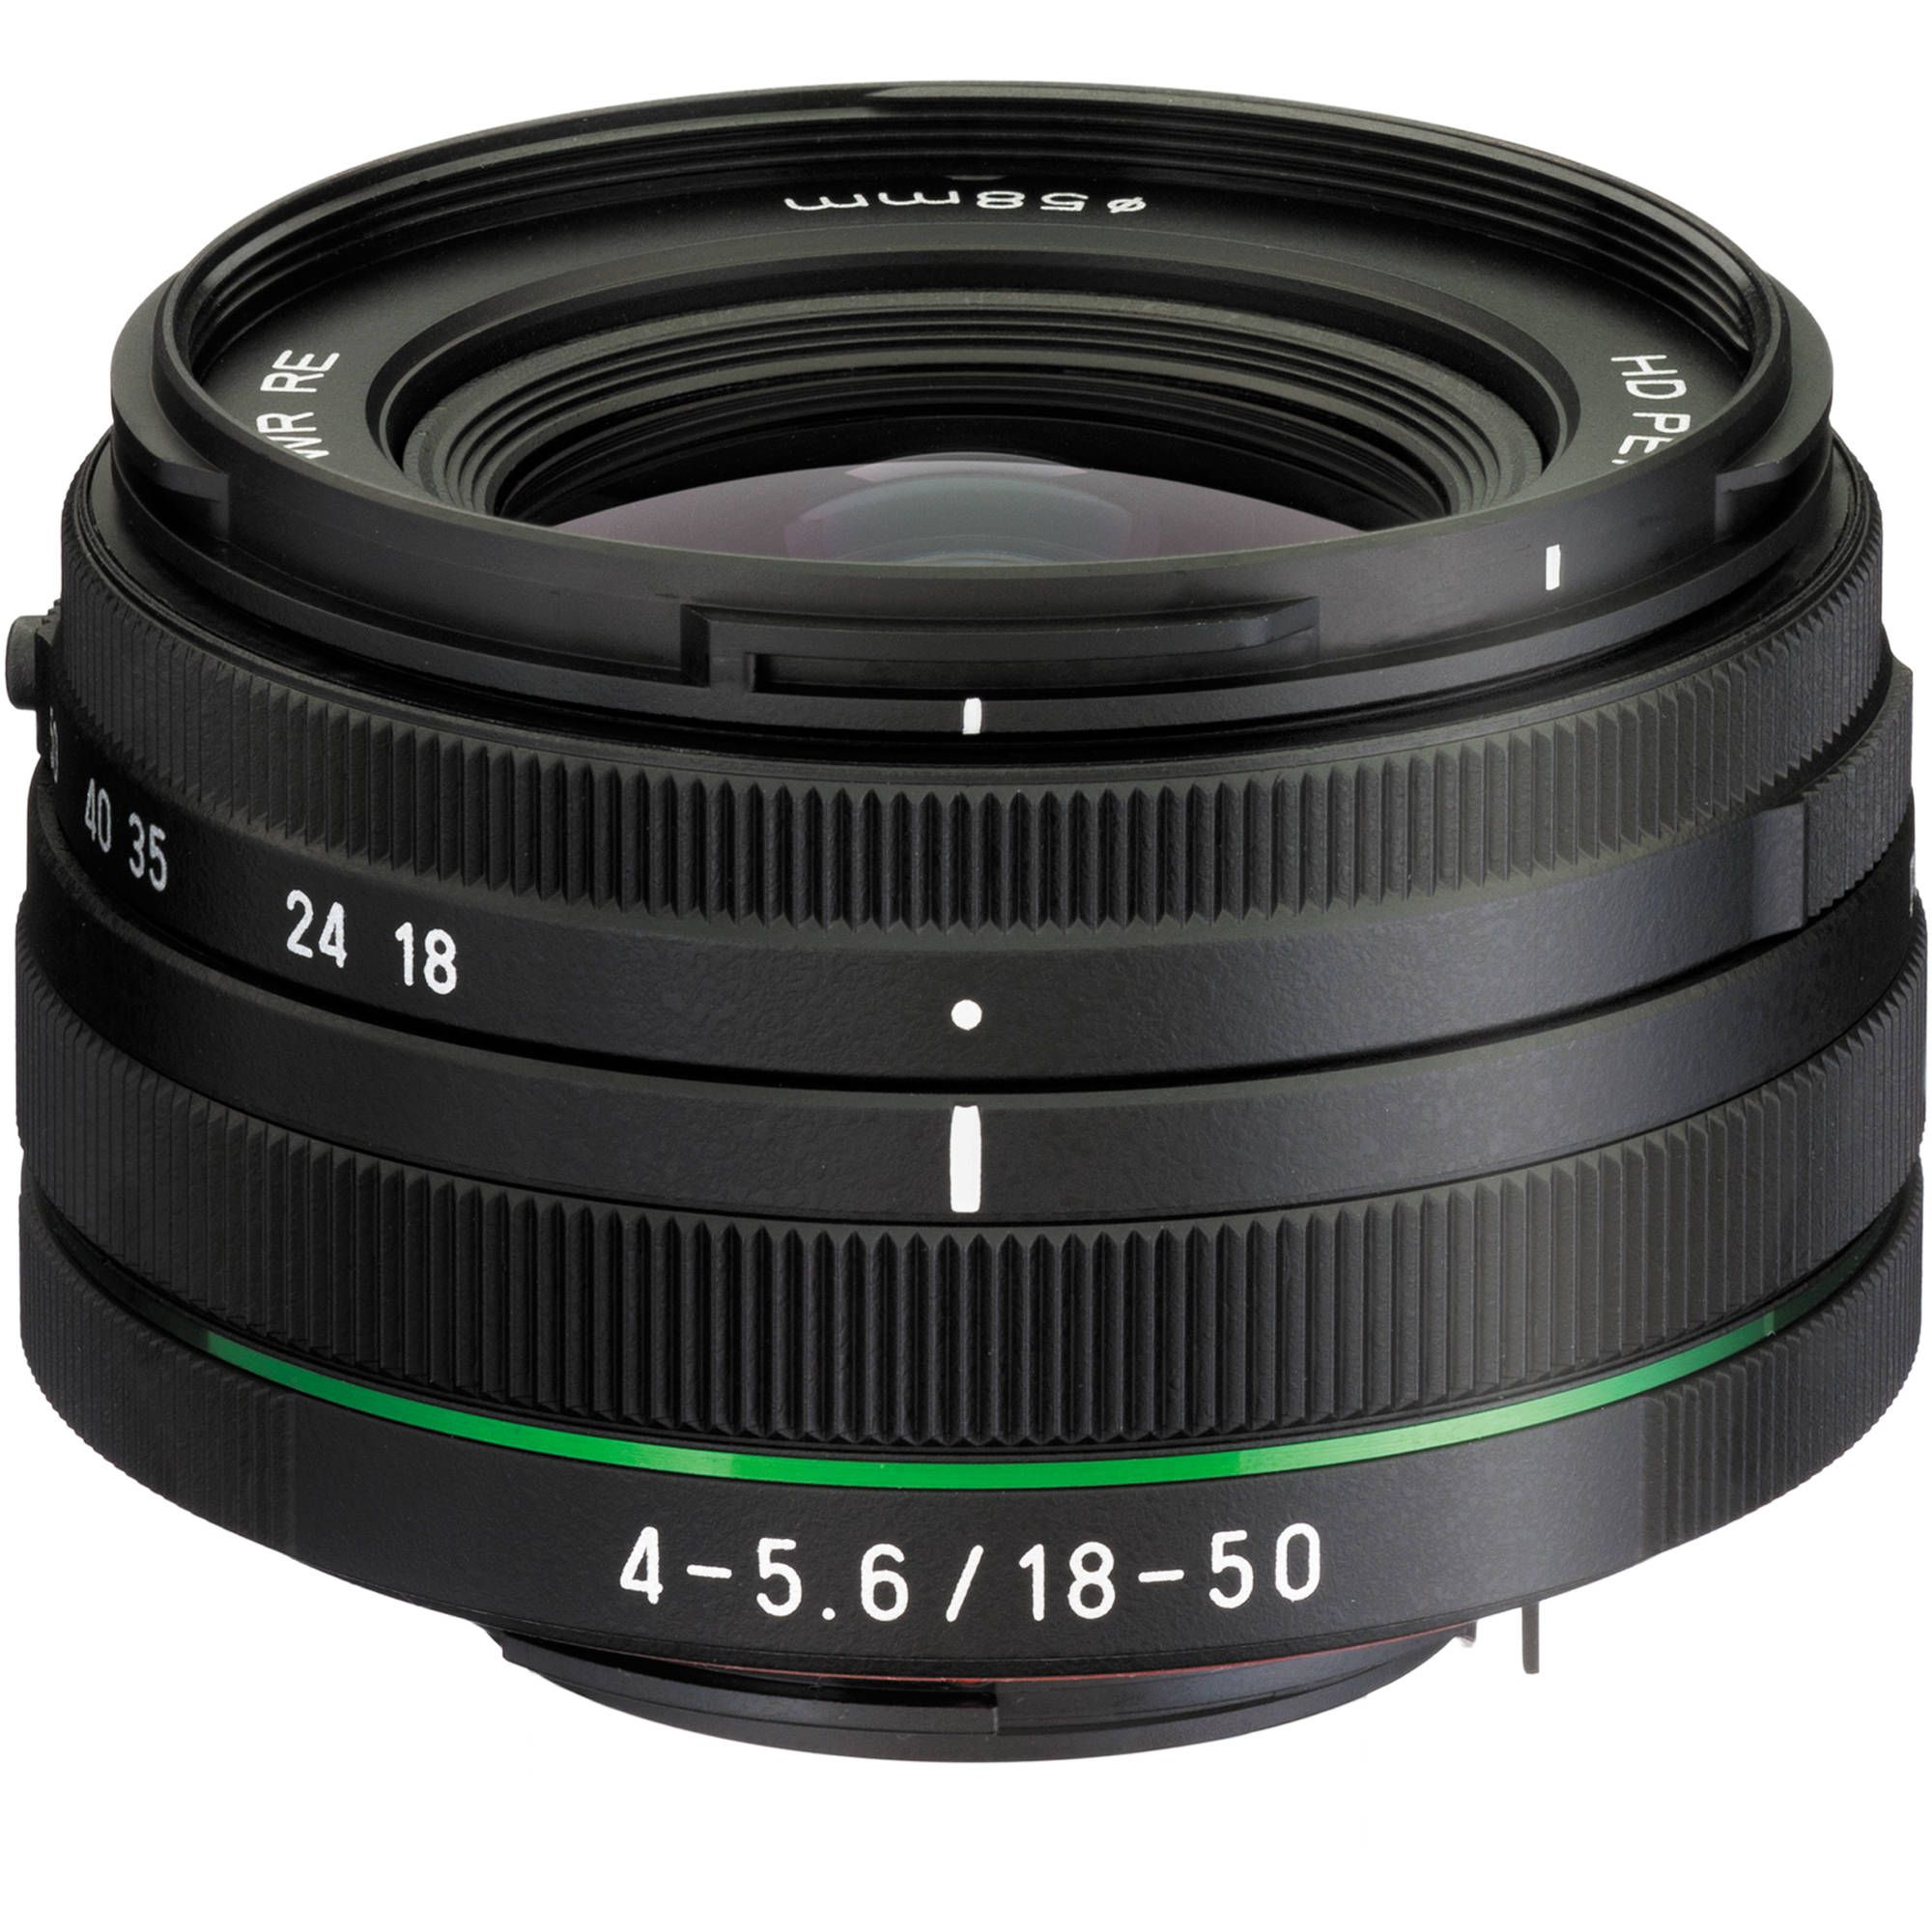 Pentax Hd Pentax Da 18 50mm F 4 0 5 6 Dc Wr Re Lens Pentax Digital Camera Lens Photo Lens